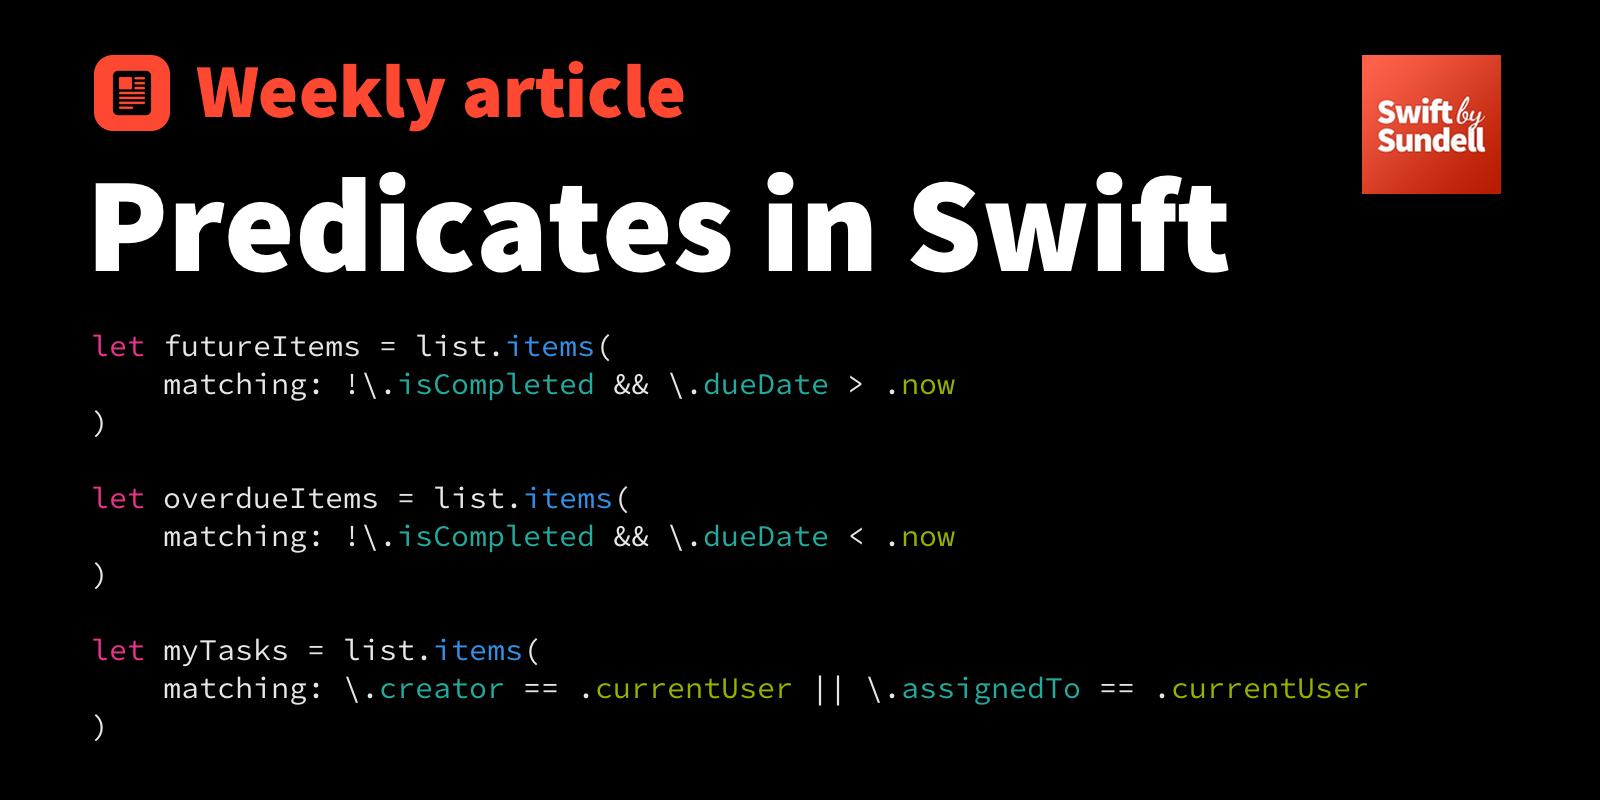 Predicates in Swift   Swift by Sundell